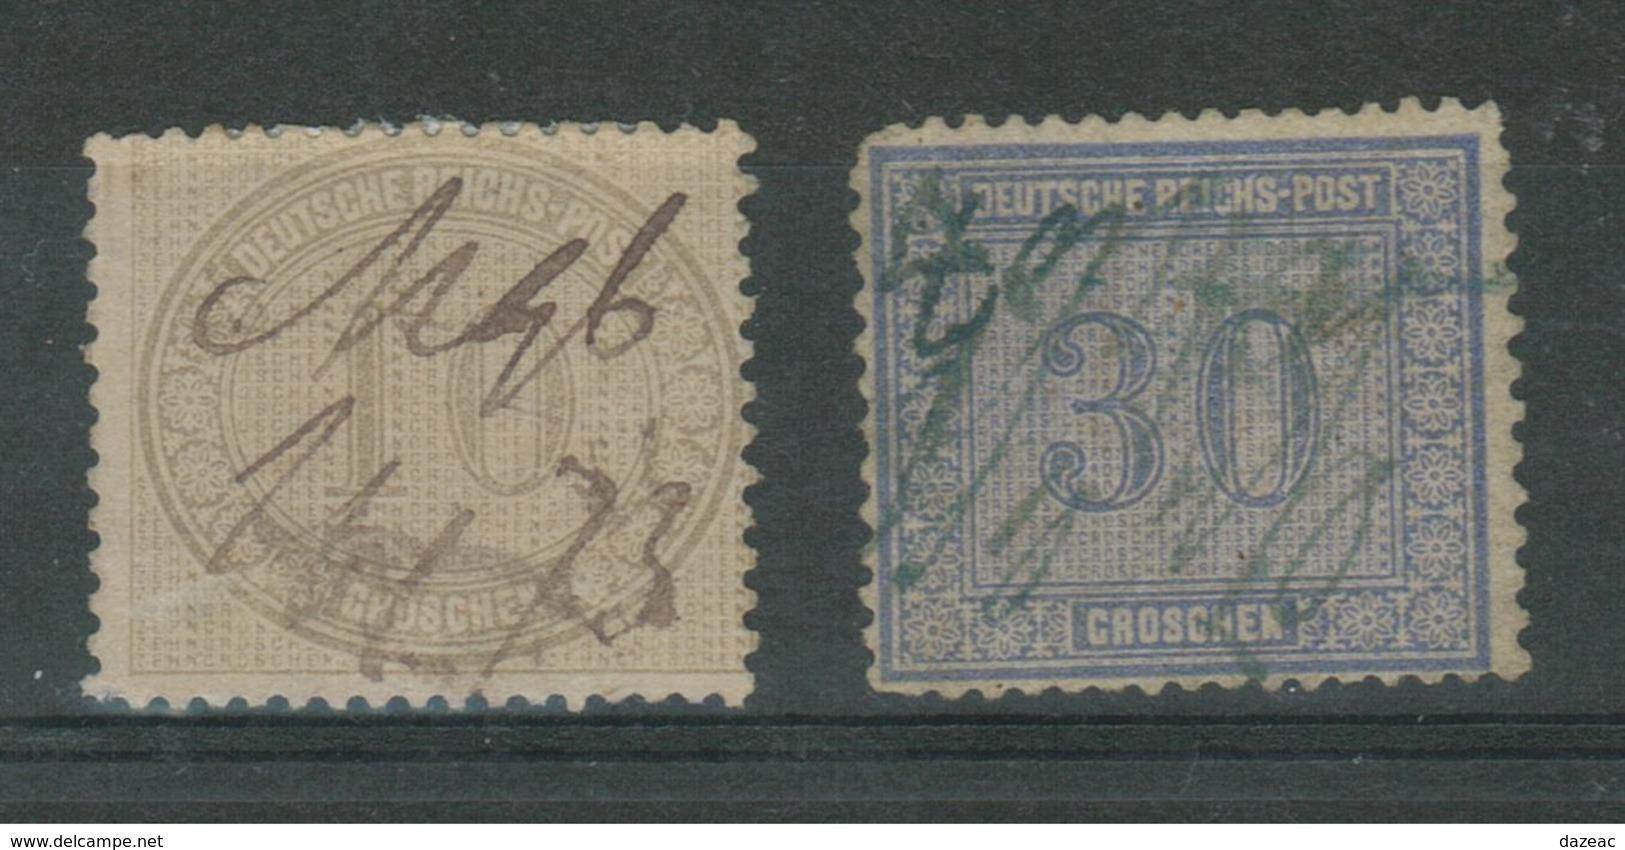 Duitse Rijk / Deutsches Reich DR 12 & 13 Used - Duitsland